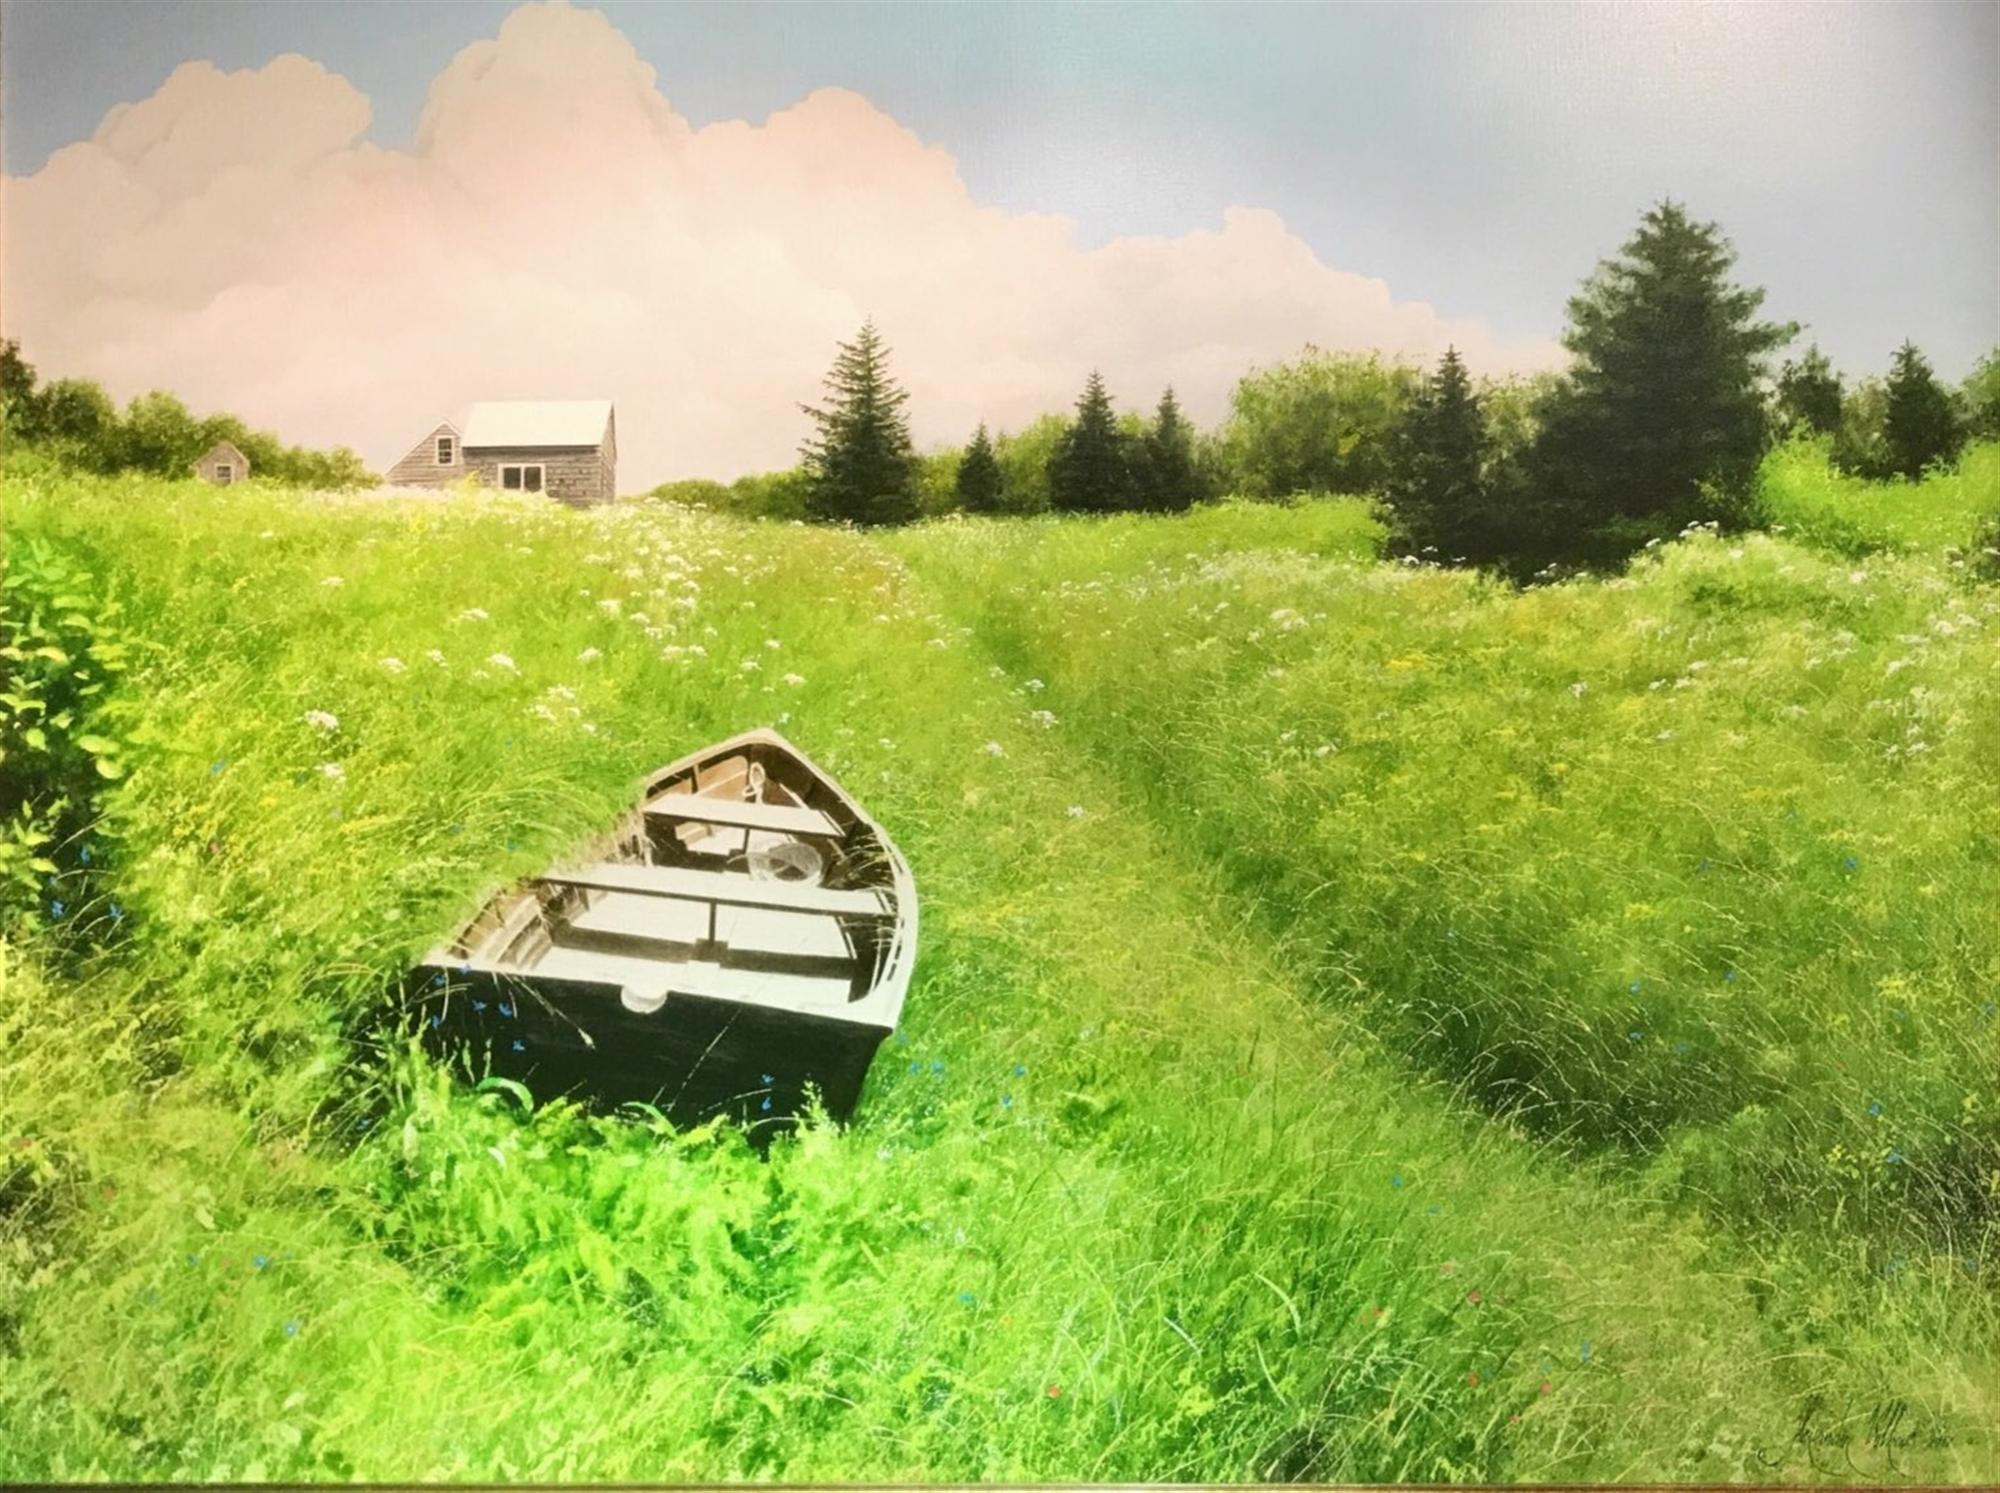 The Voyage by Alexander Volkov